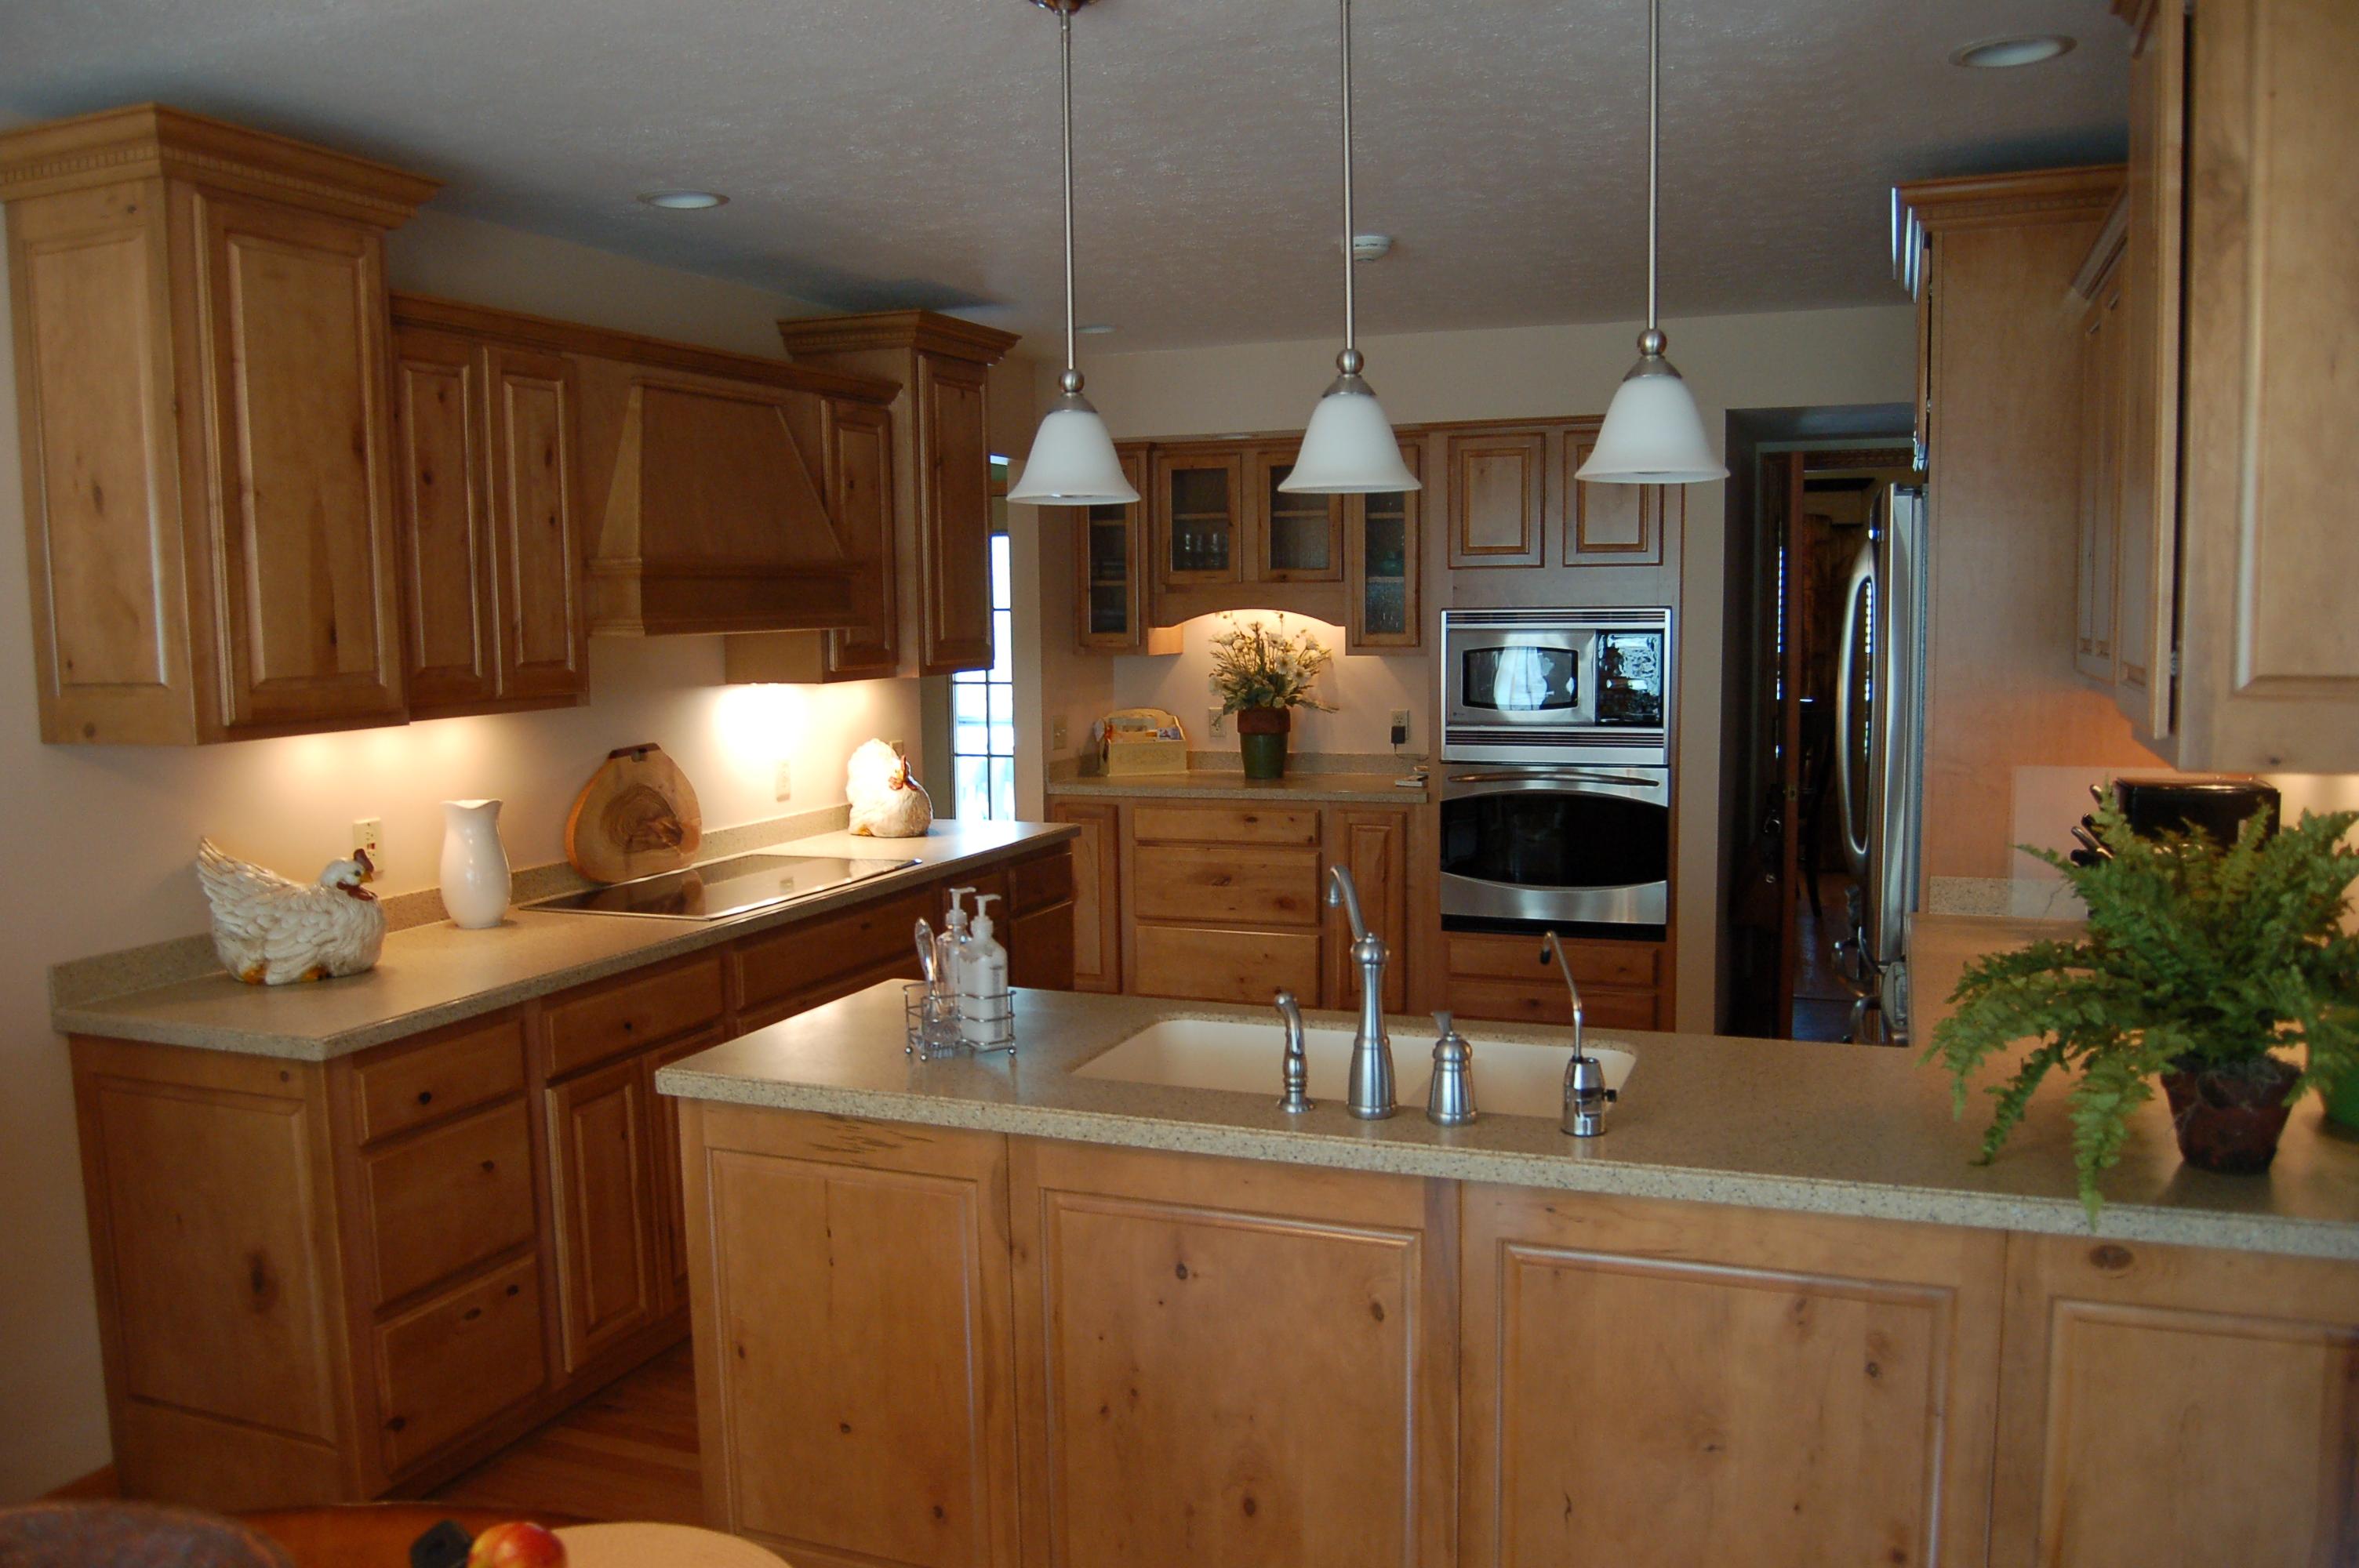 remodeled kitchens kitchen remodeling manassas va St Louis Kitchen And Bath Remodeling Call Barker Son